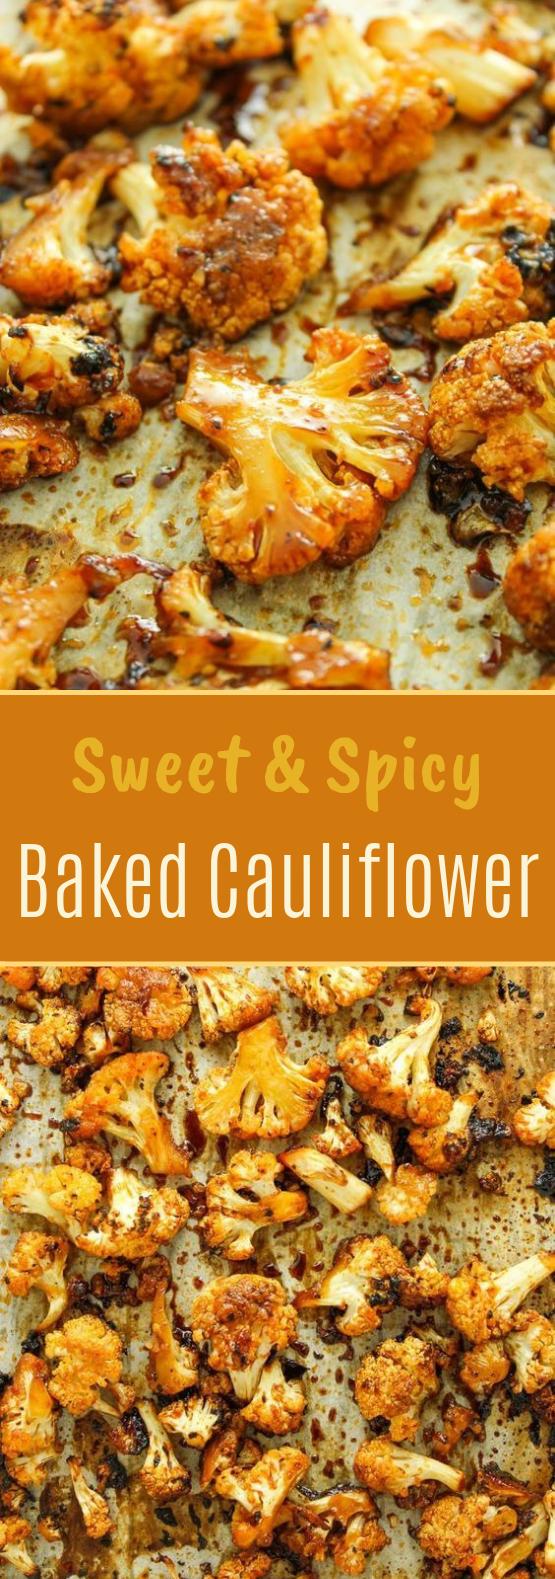 Sweet and Spicy Baked Cauliflower #sidedish #vegetarian